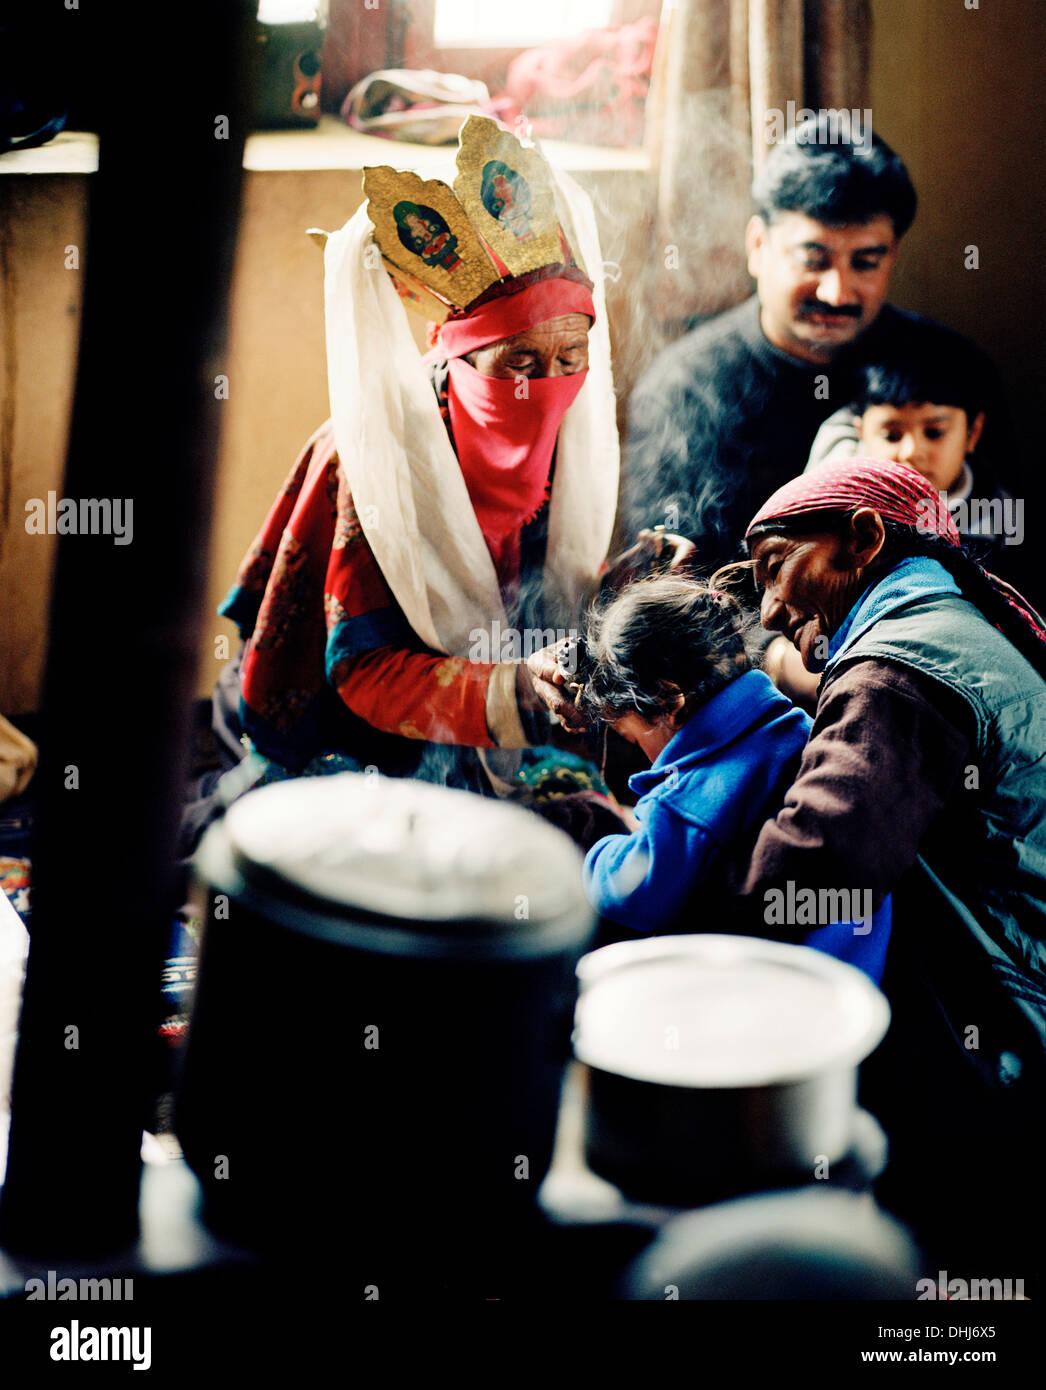 Oracle of Sabu, 77 year old healer Sonam Sangmu is treating a child in her kitchen near Leh, Ladakh, Jammu and Kashmir, India - Stock Image